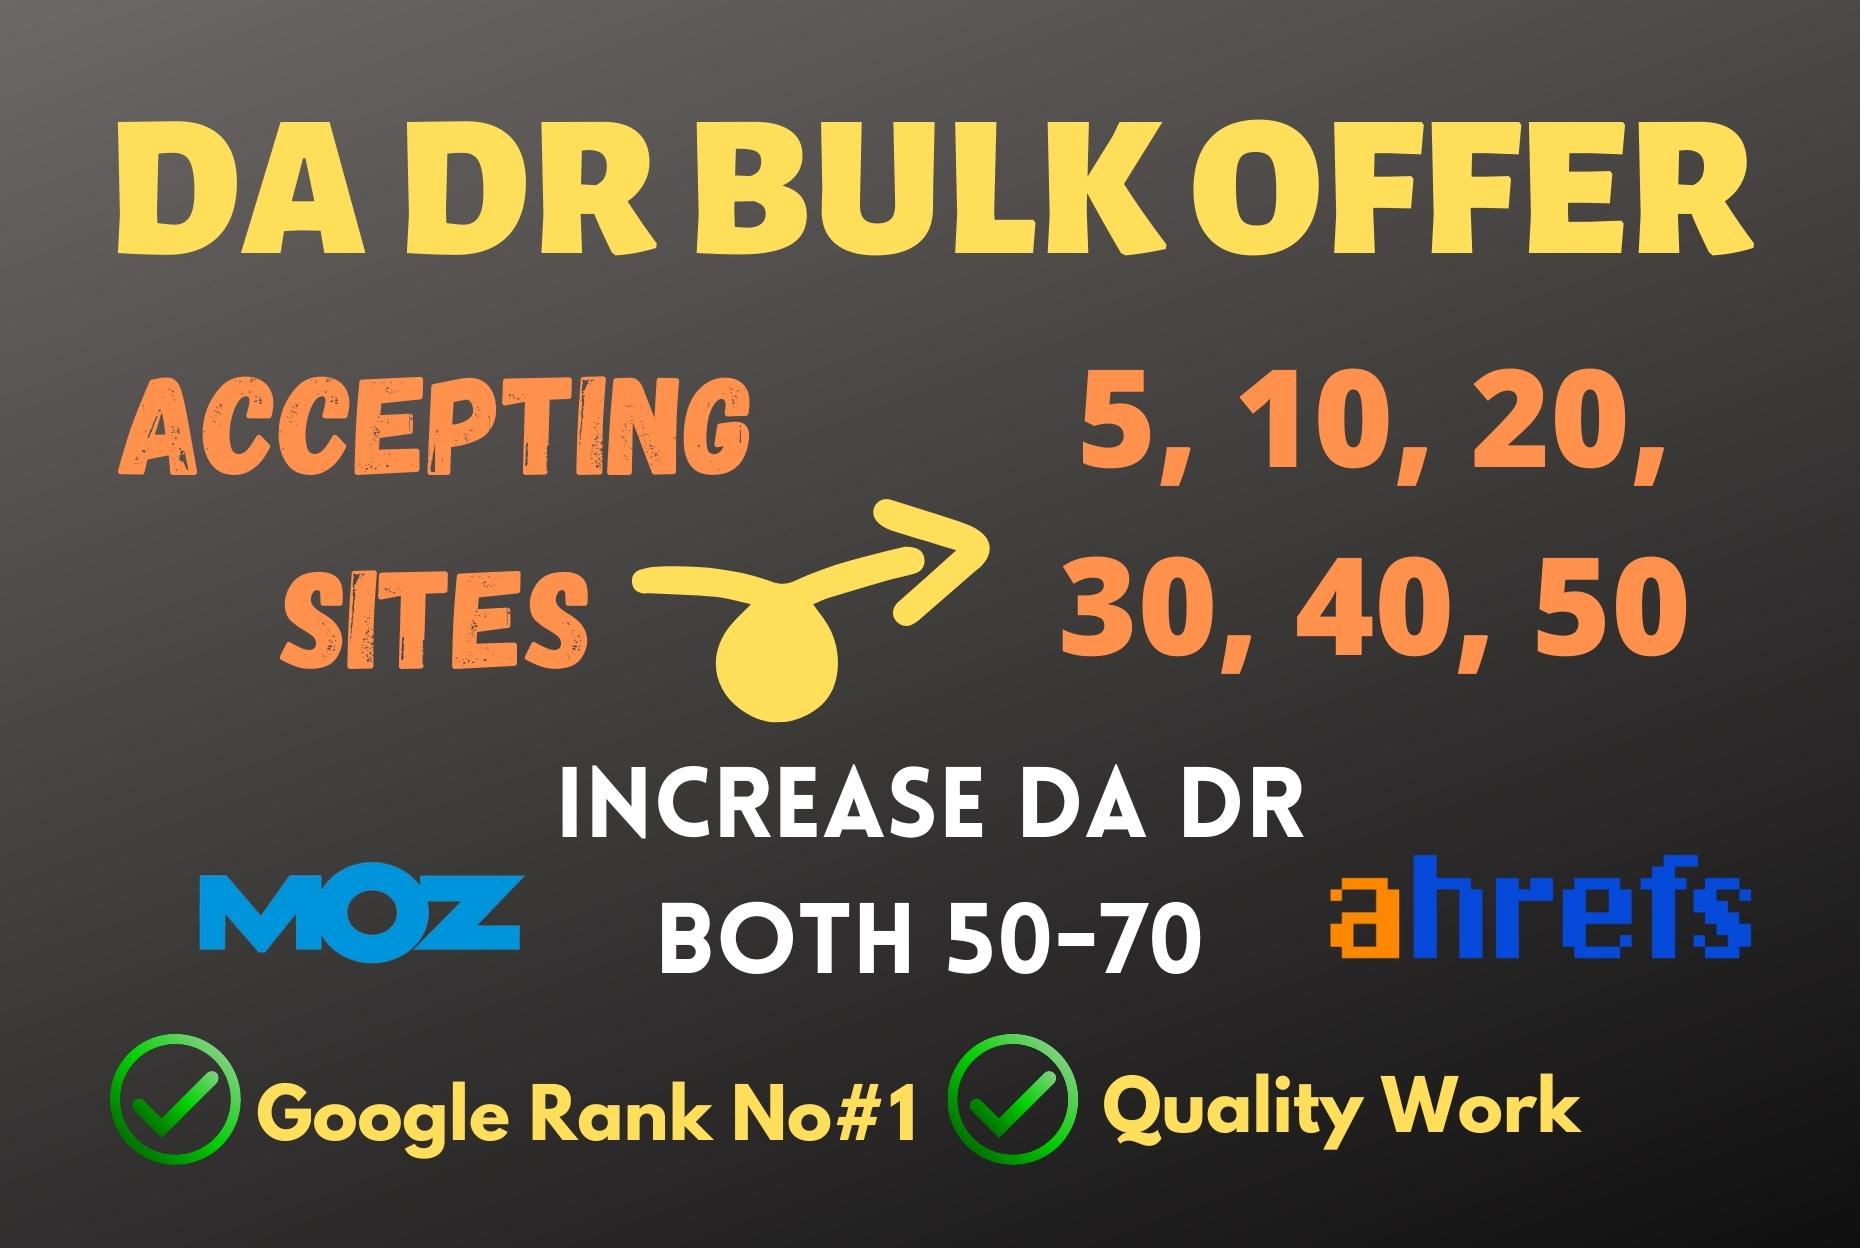 I will increase Moz DA and Ahrefs DR both 50